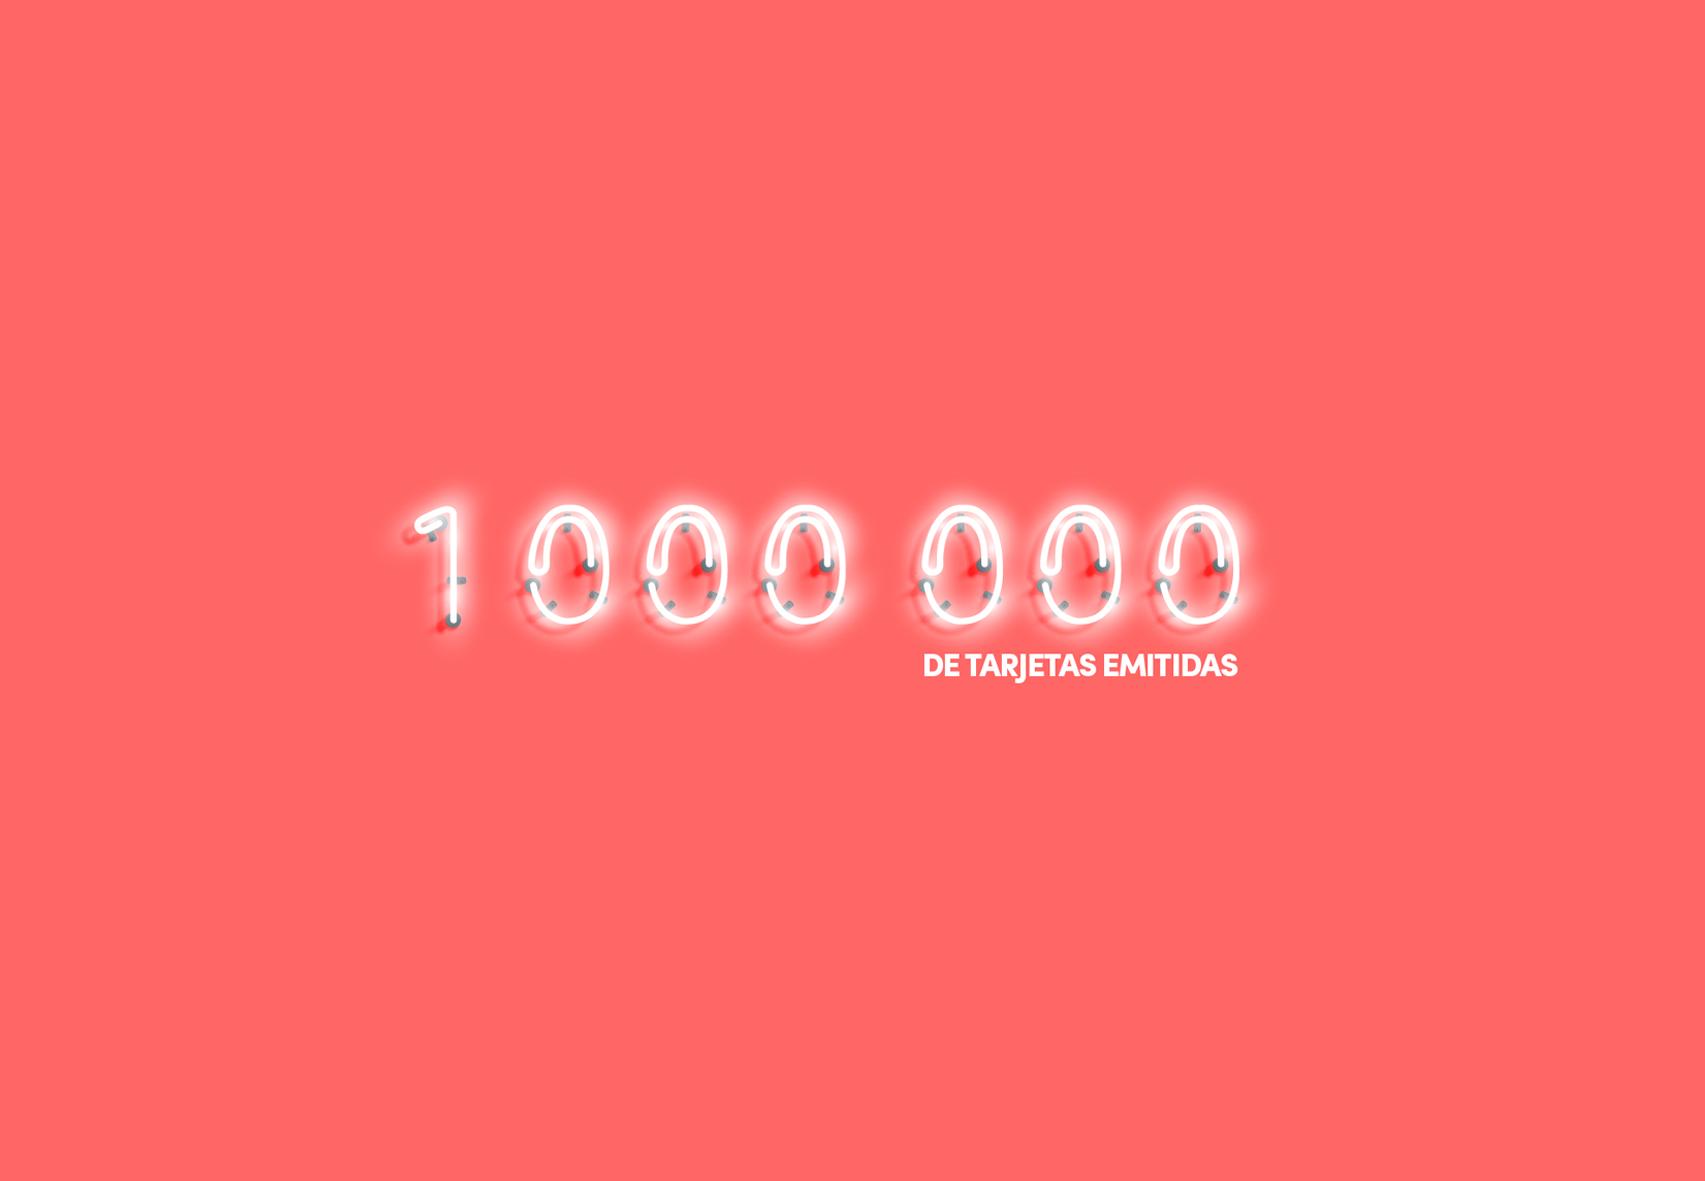 Ualá 1.000.000